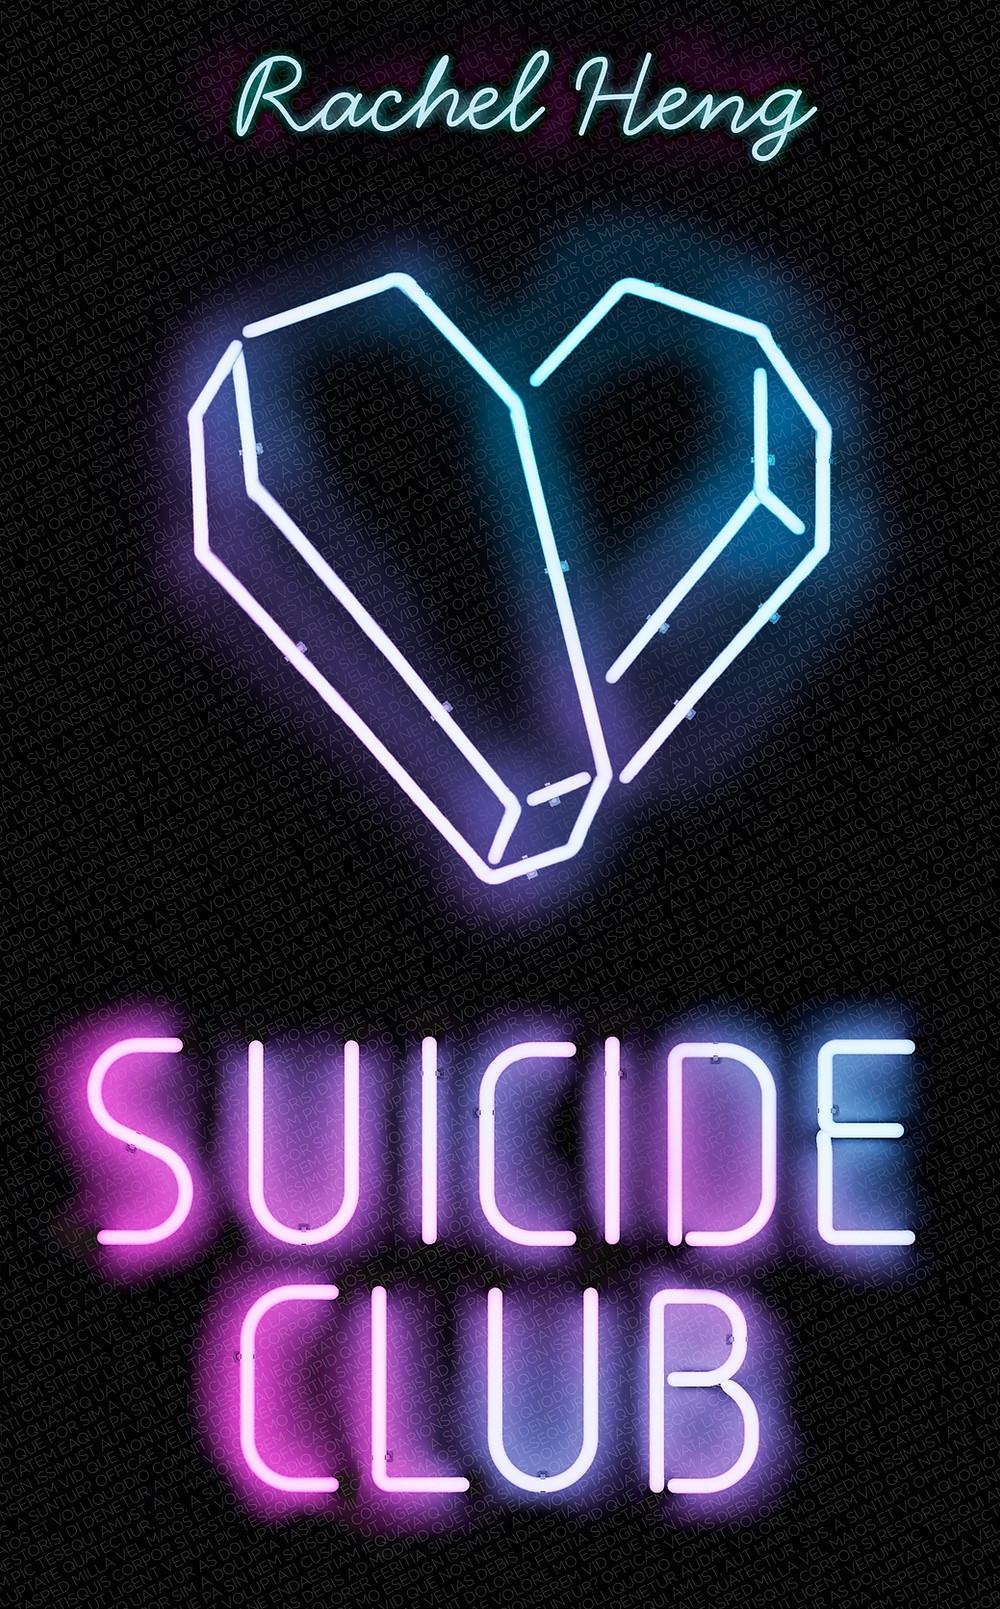 Suicide Club, The Riff Raff